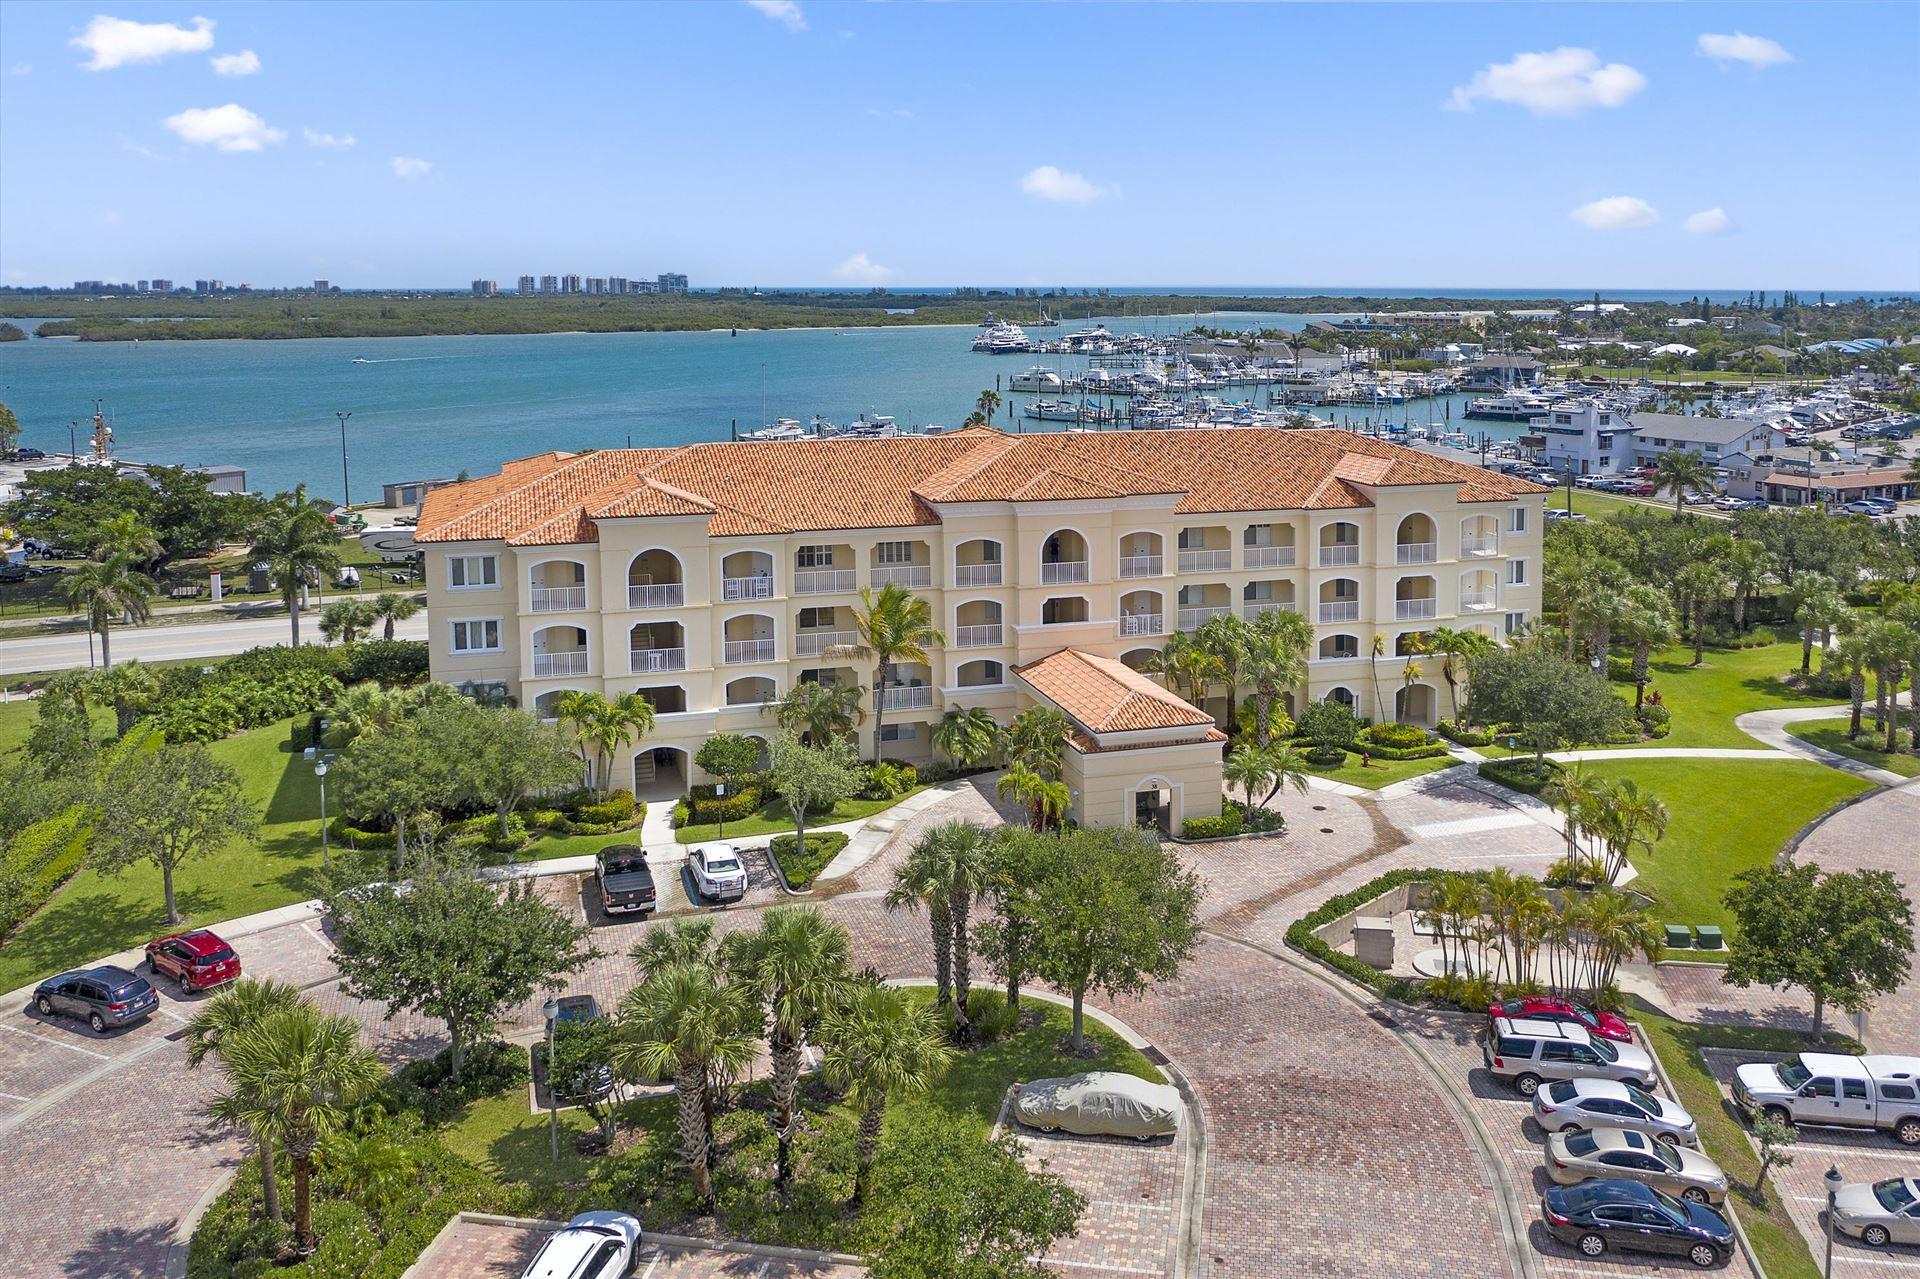 38 Harbour Isle Drive E #202, Fort Pierce, FL 34949 - #: RX-10624119